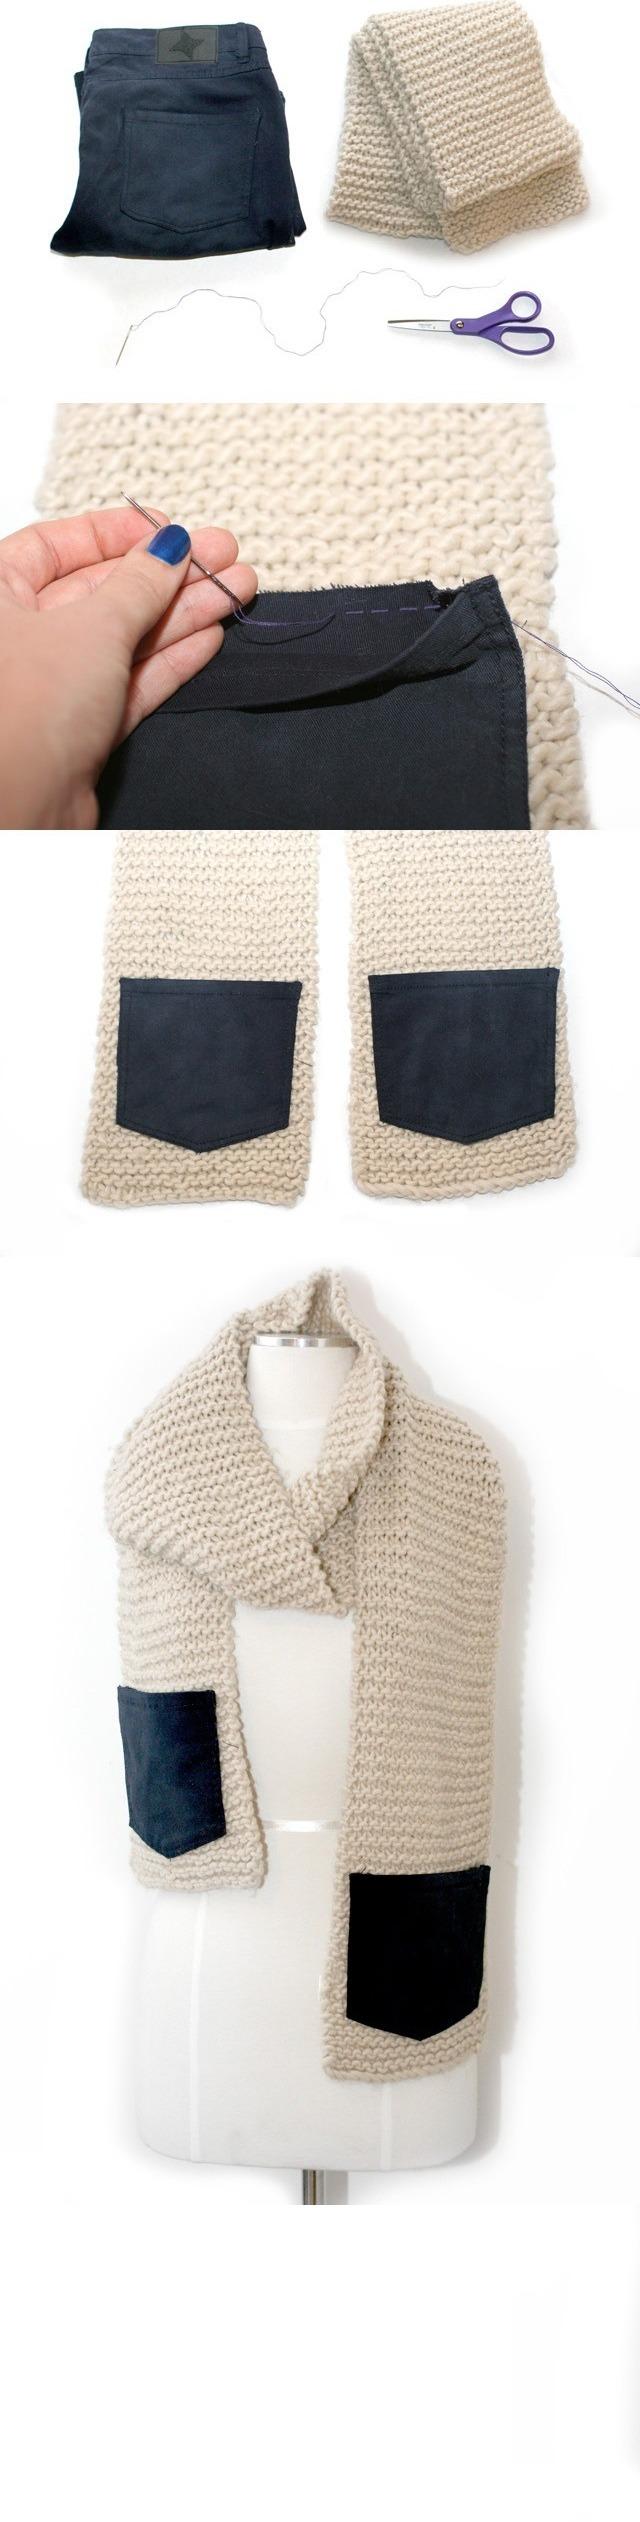 scarf-pocket